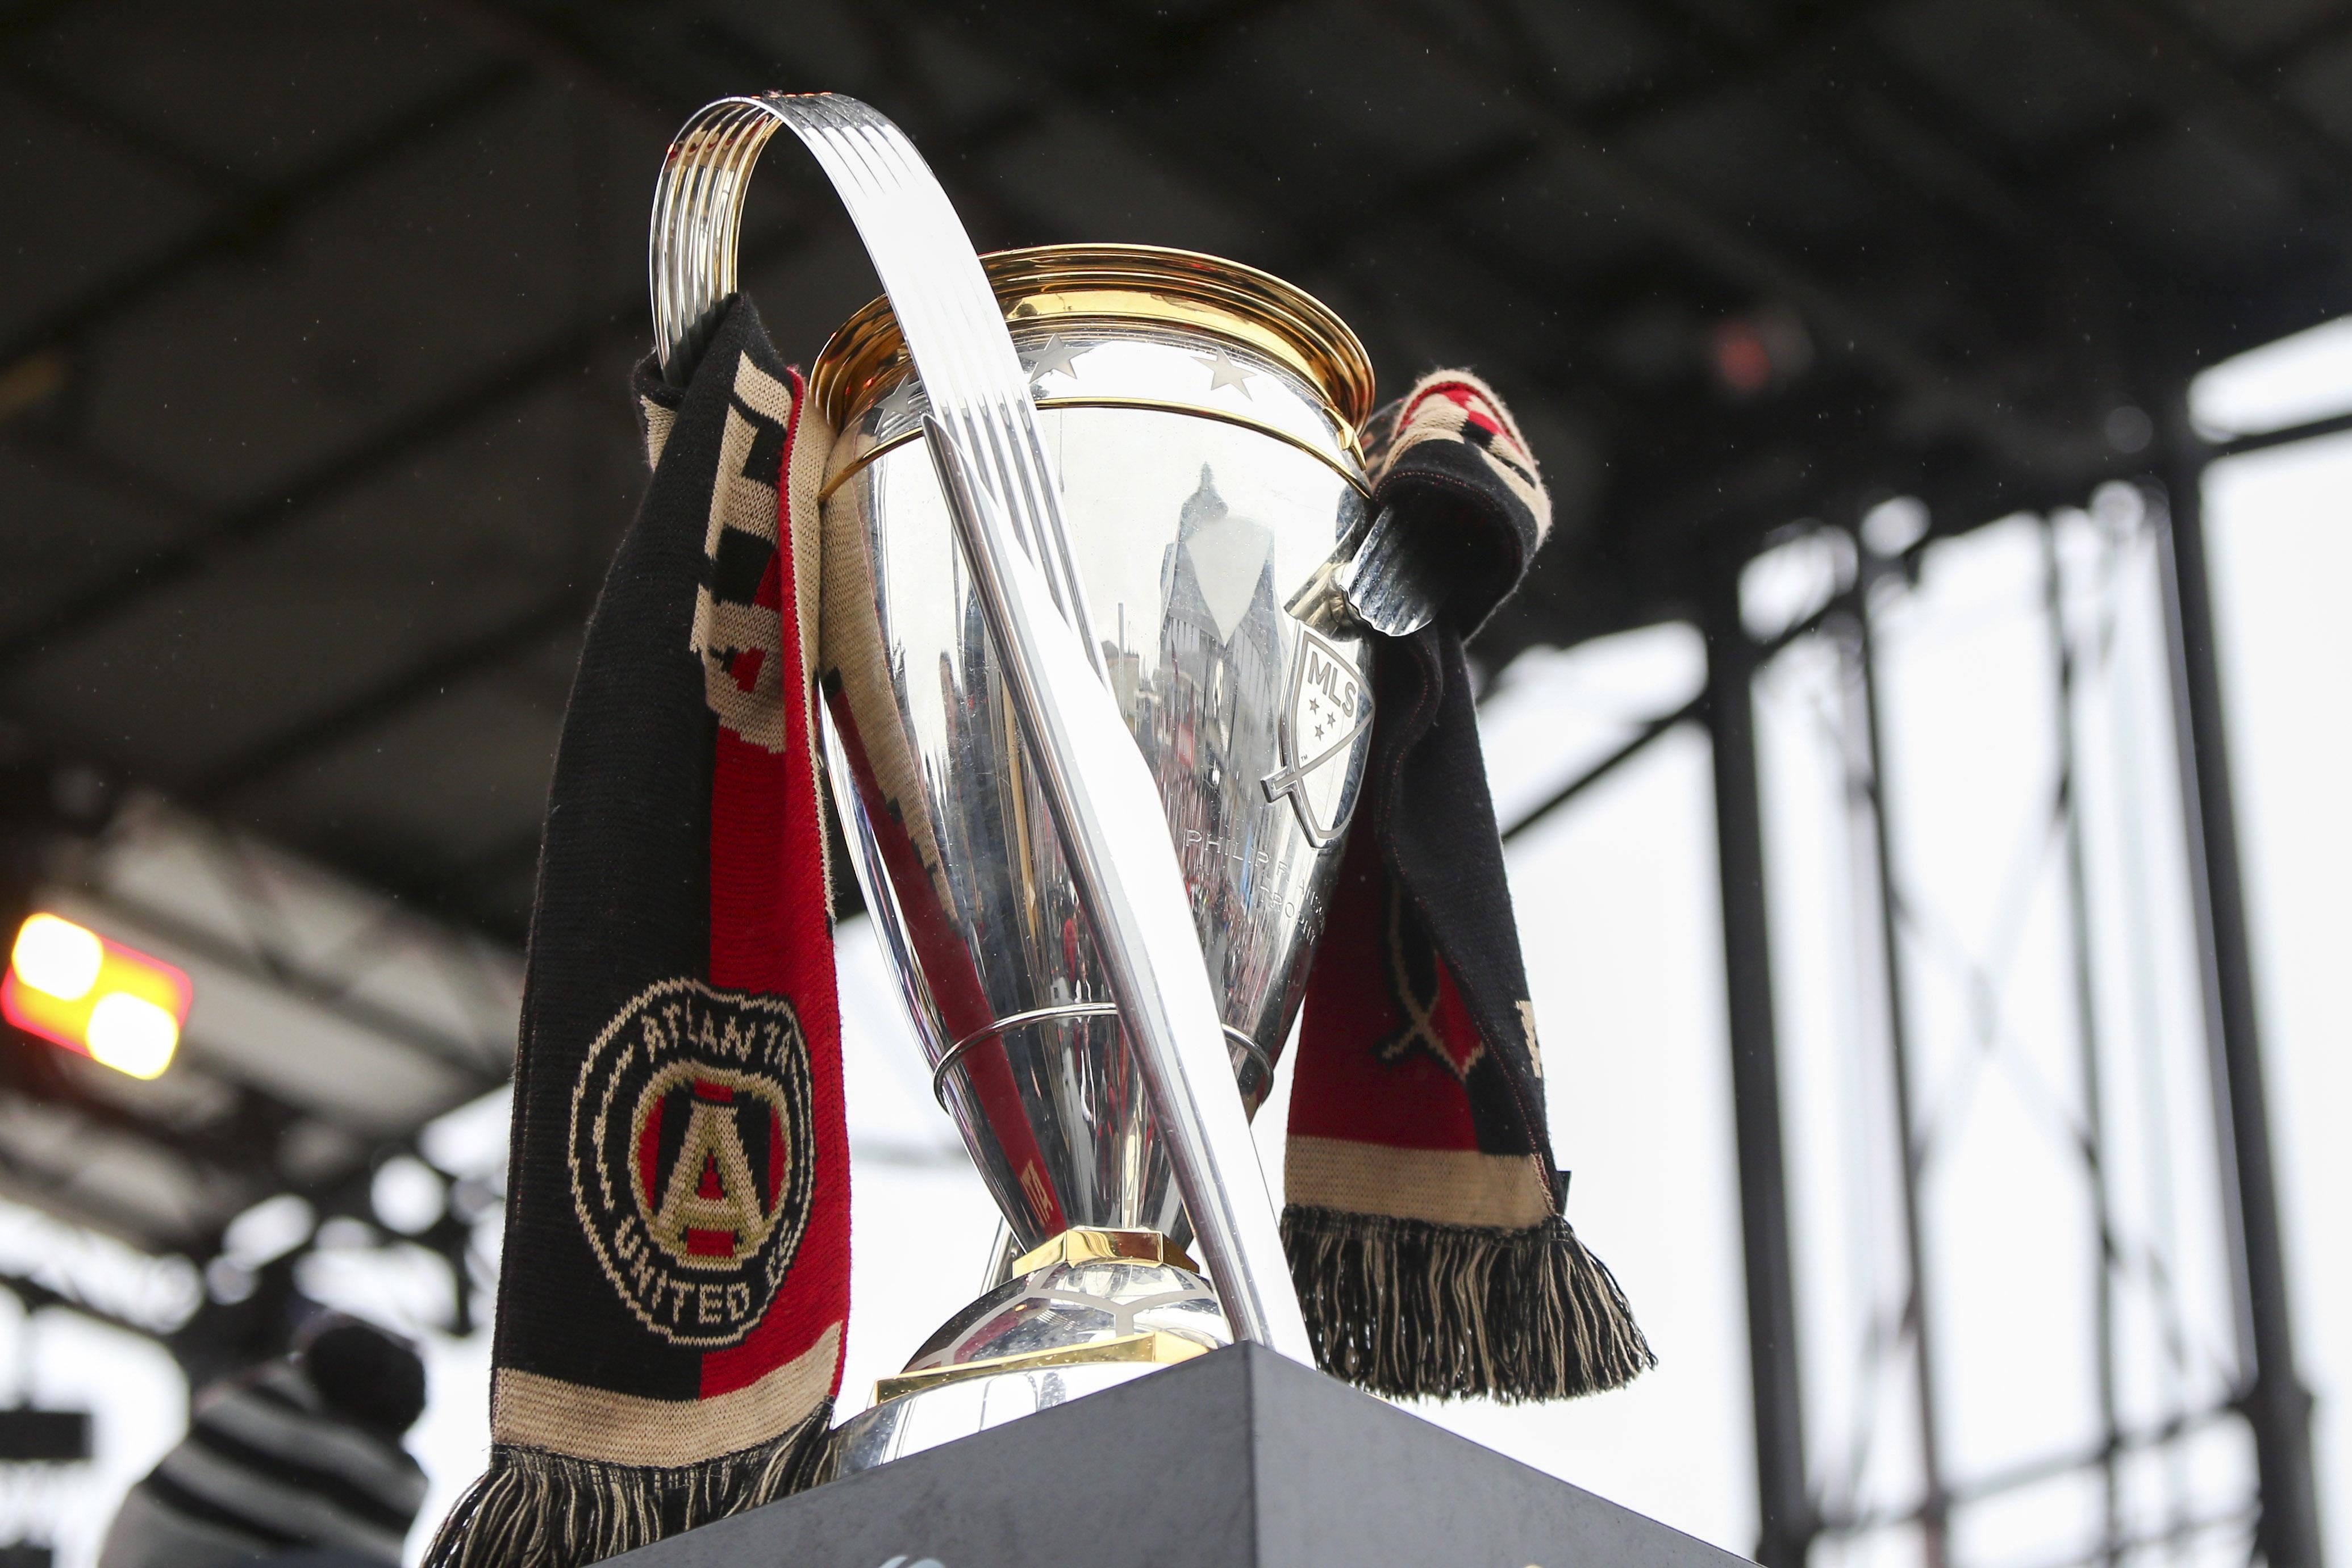 MLS: Atlanta United FC-MLS CUP Champions Parade